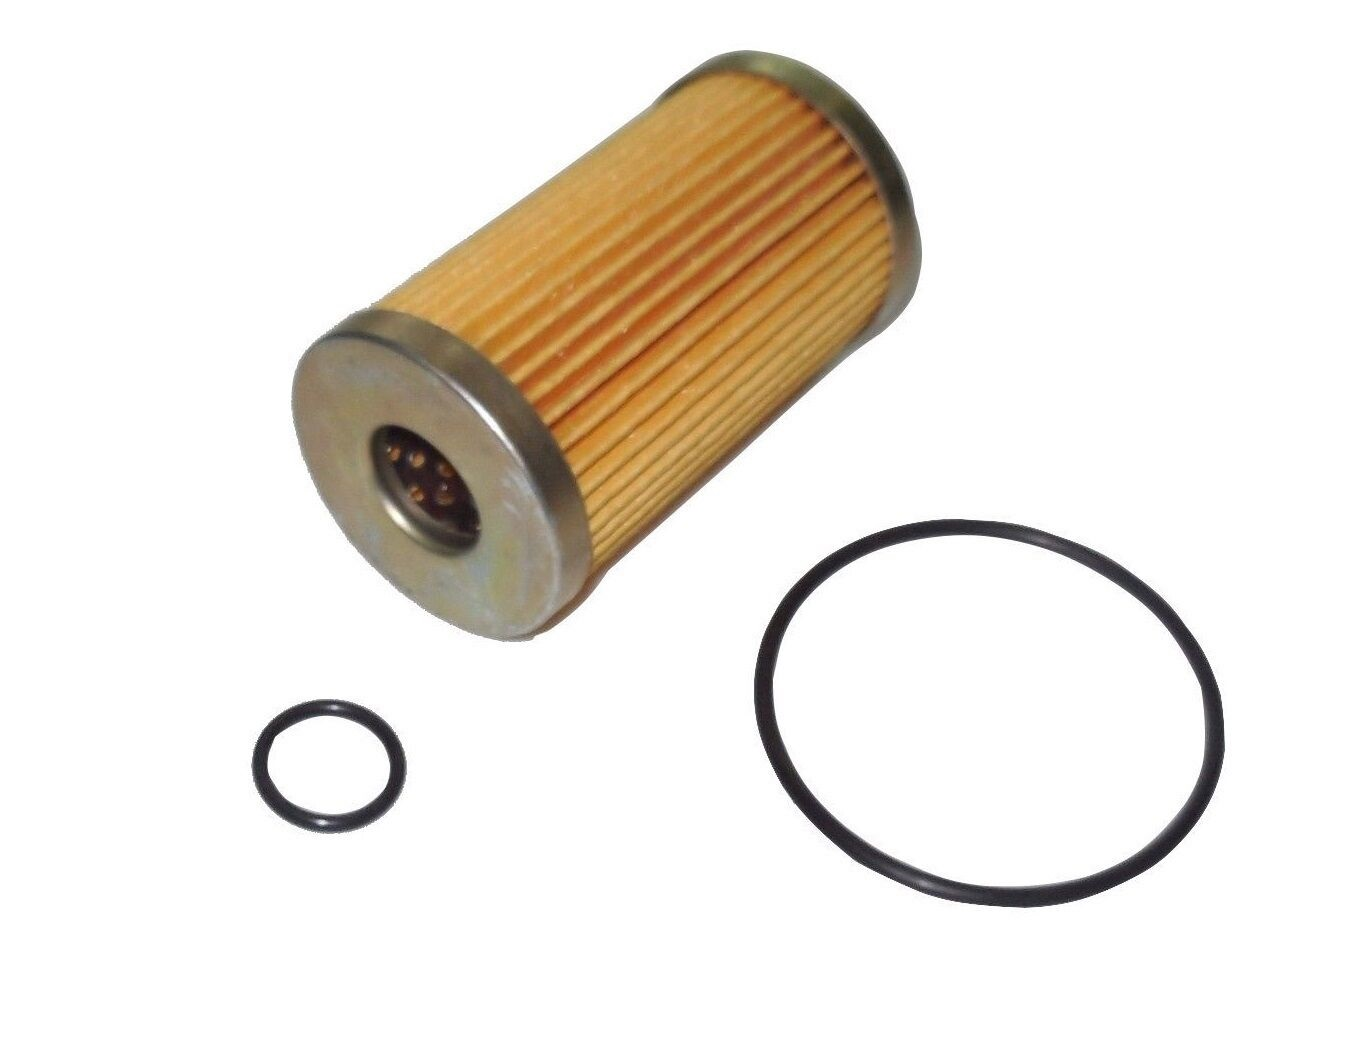 new ford holland fuel filter with o-rings tc48da, tc55da  kumar bros usa